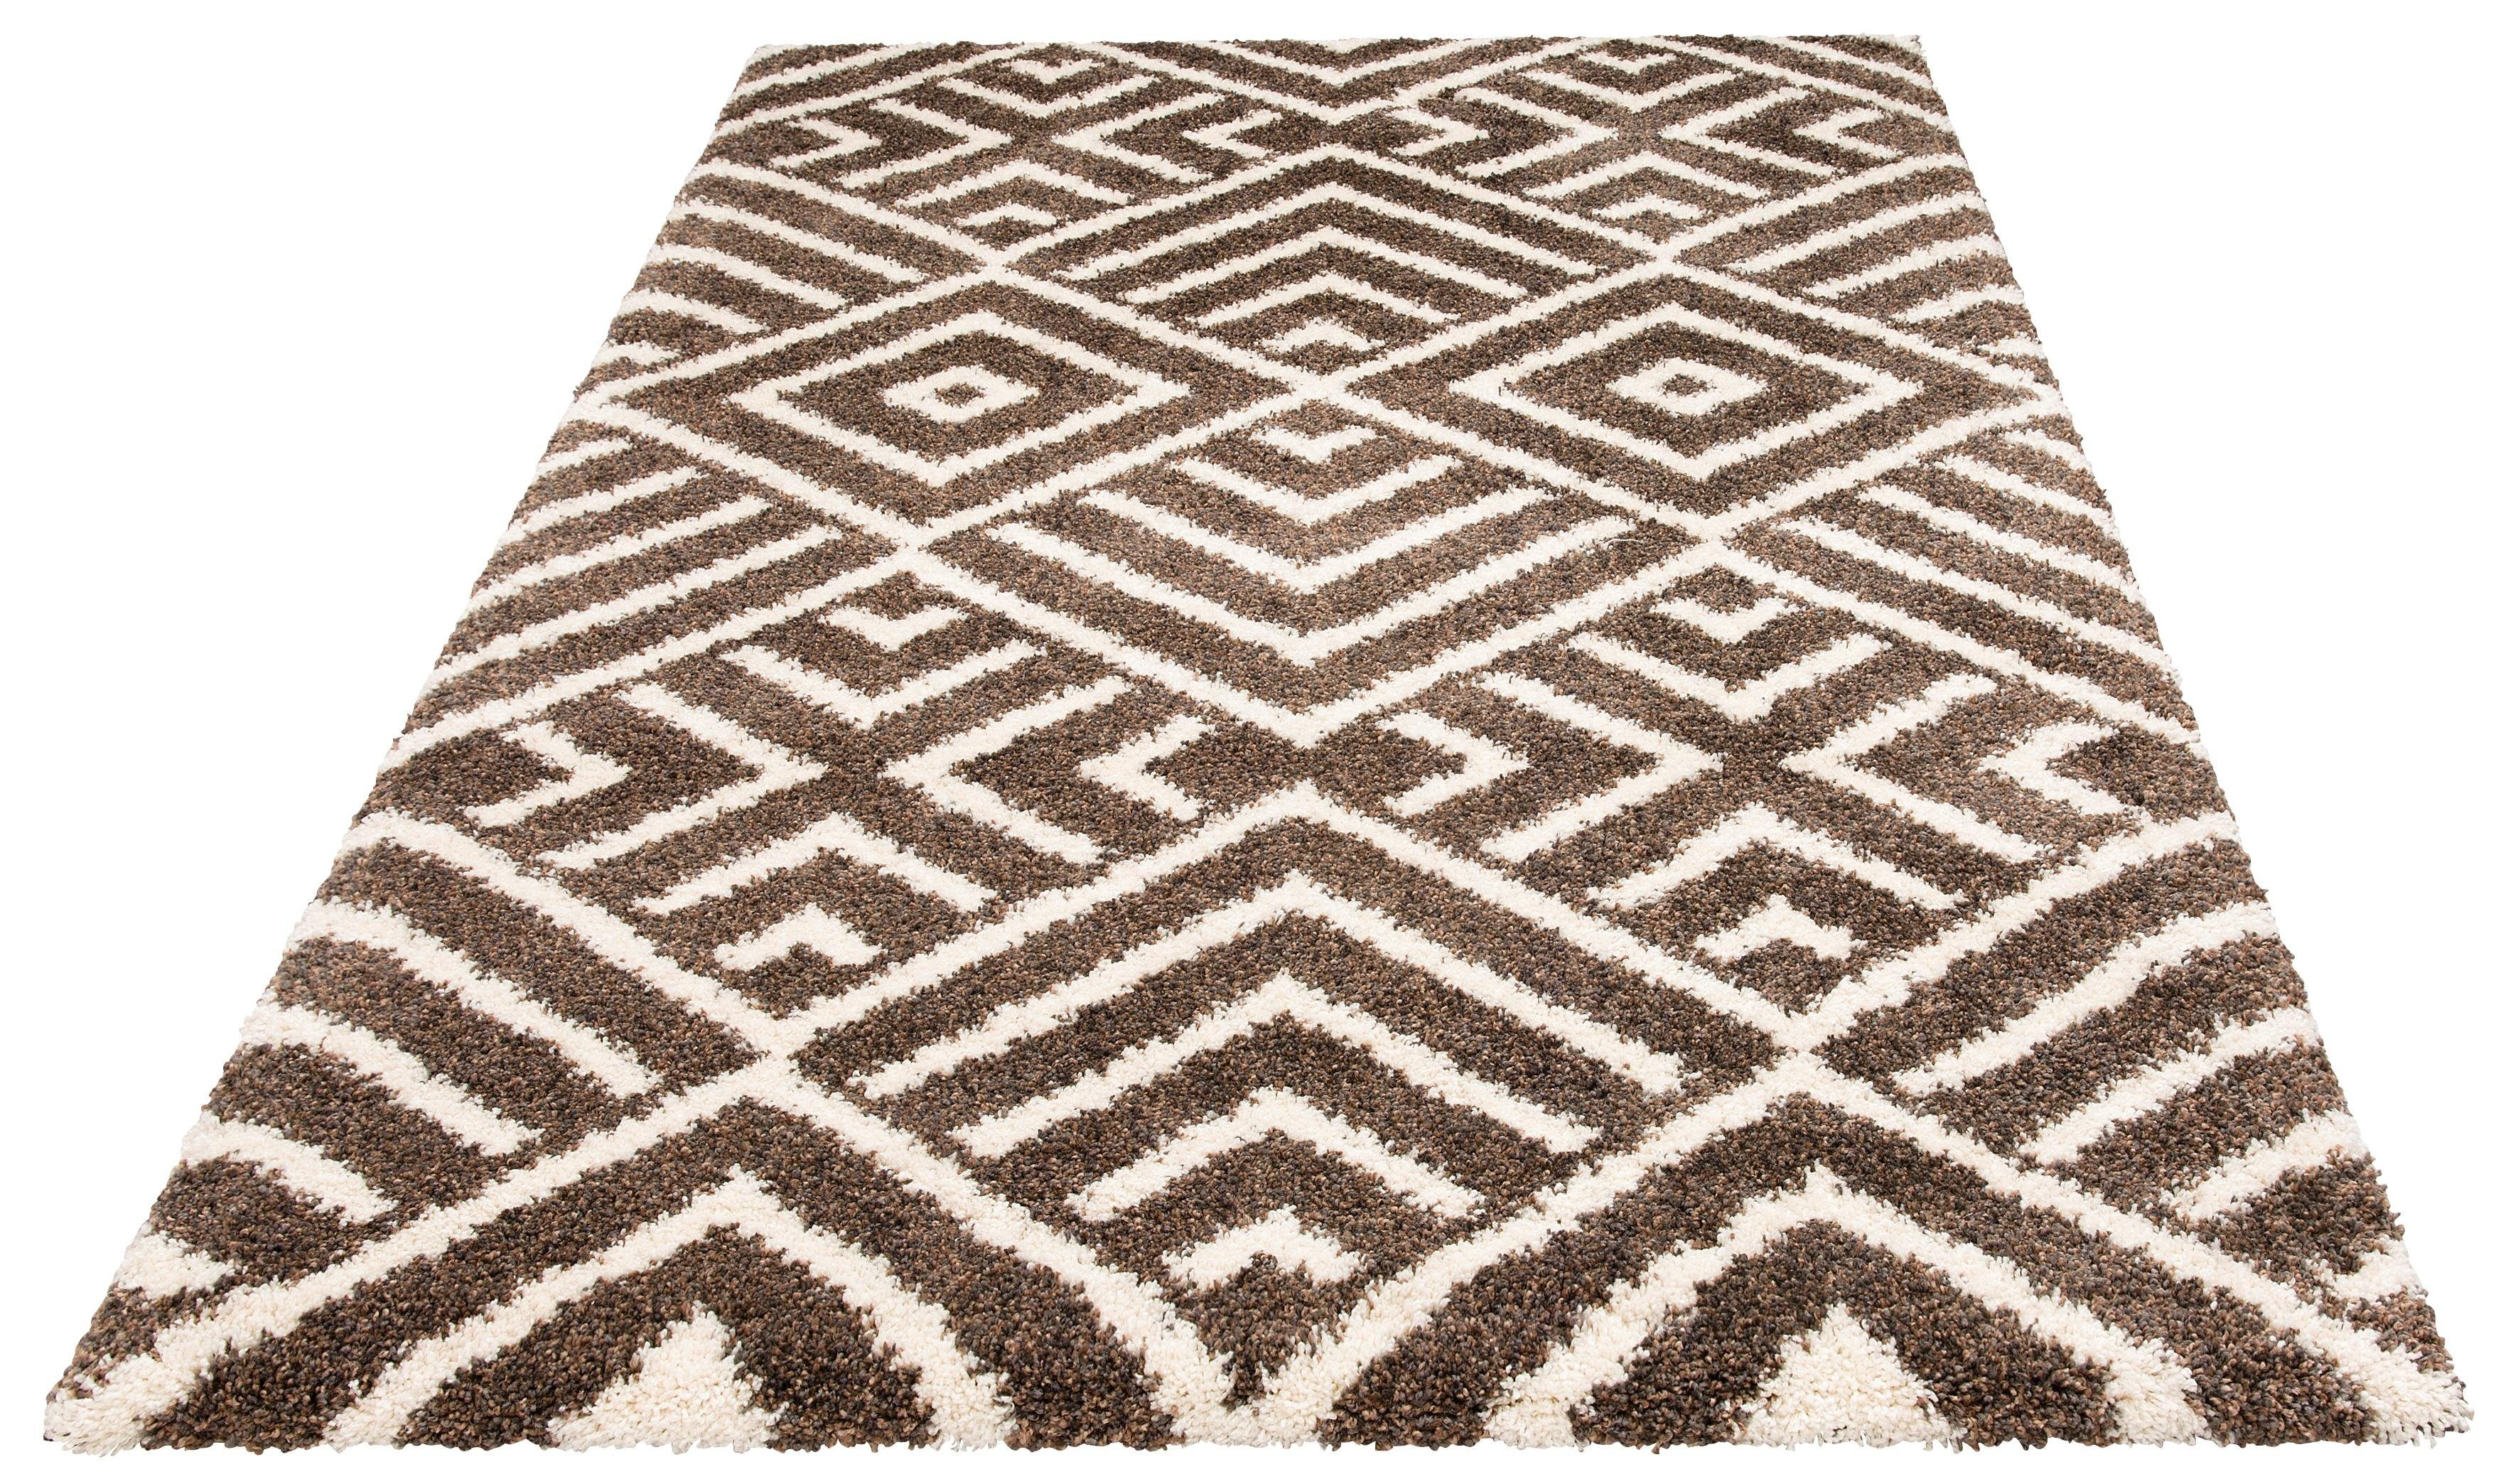 Hochflor-Teppich Banel Bruno Banani rechteckig Höhe 40 mm maschinell gewebt